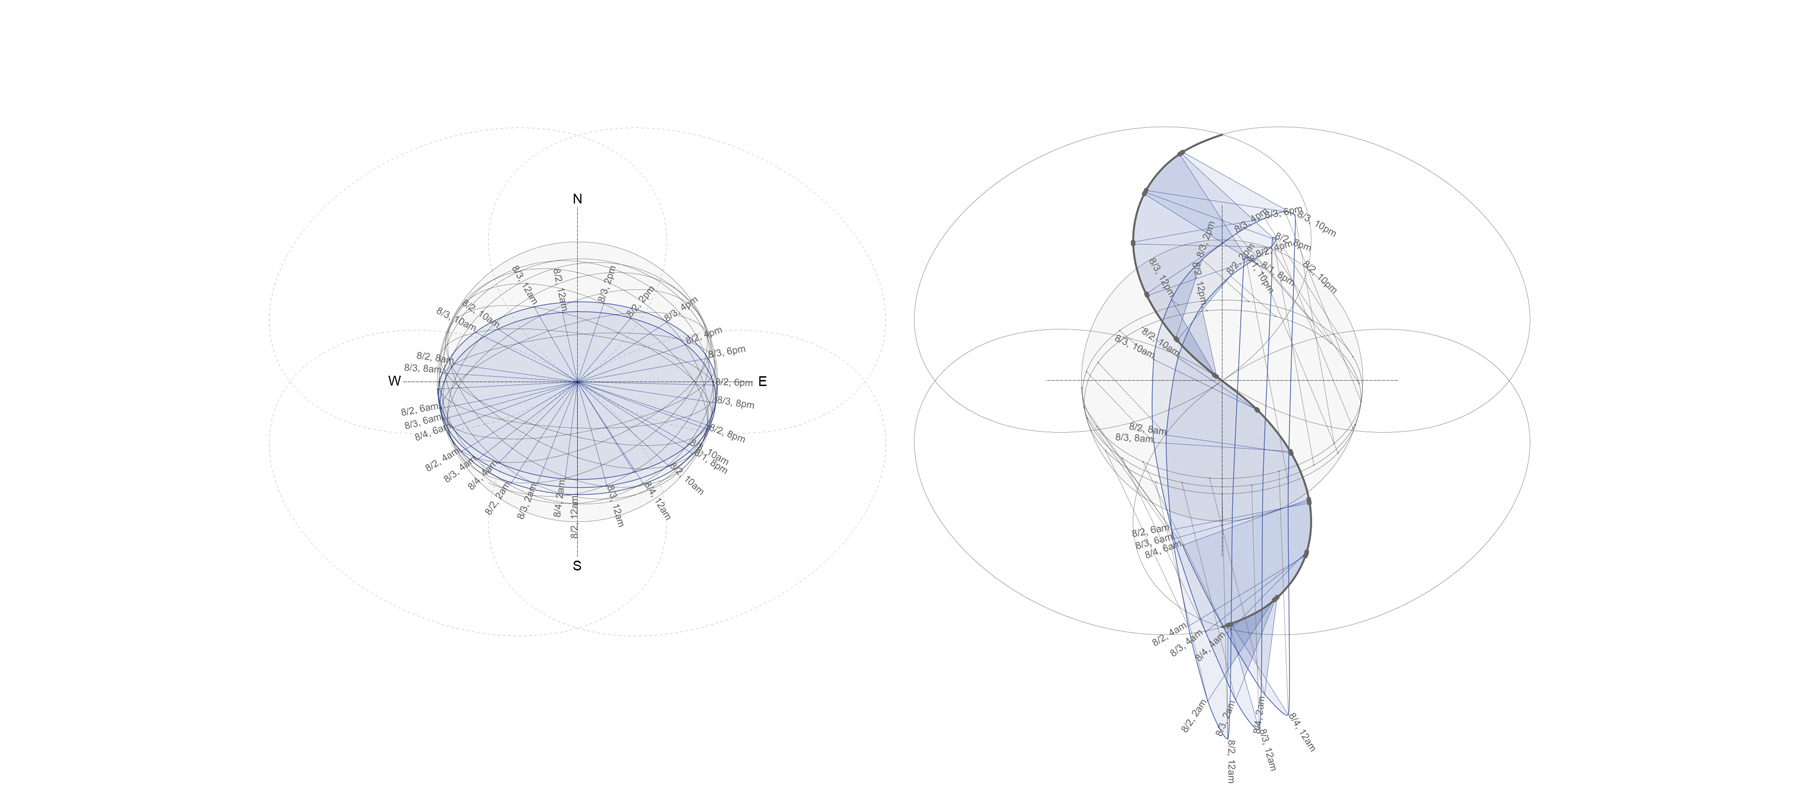 ................ moon path diagram / observer path diagram ................